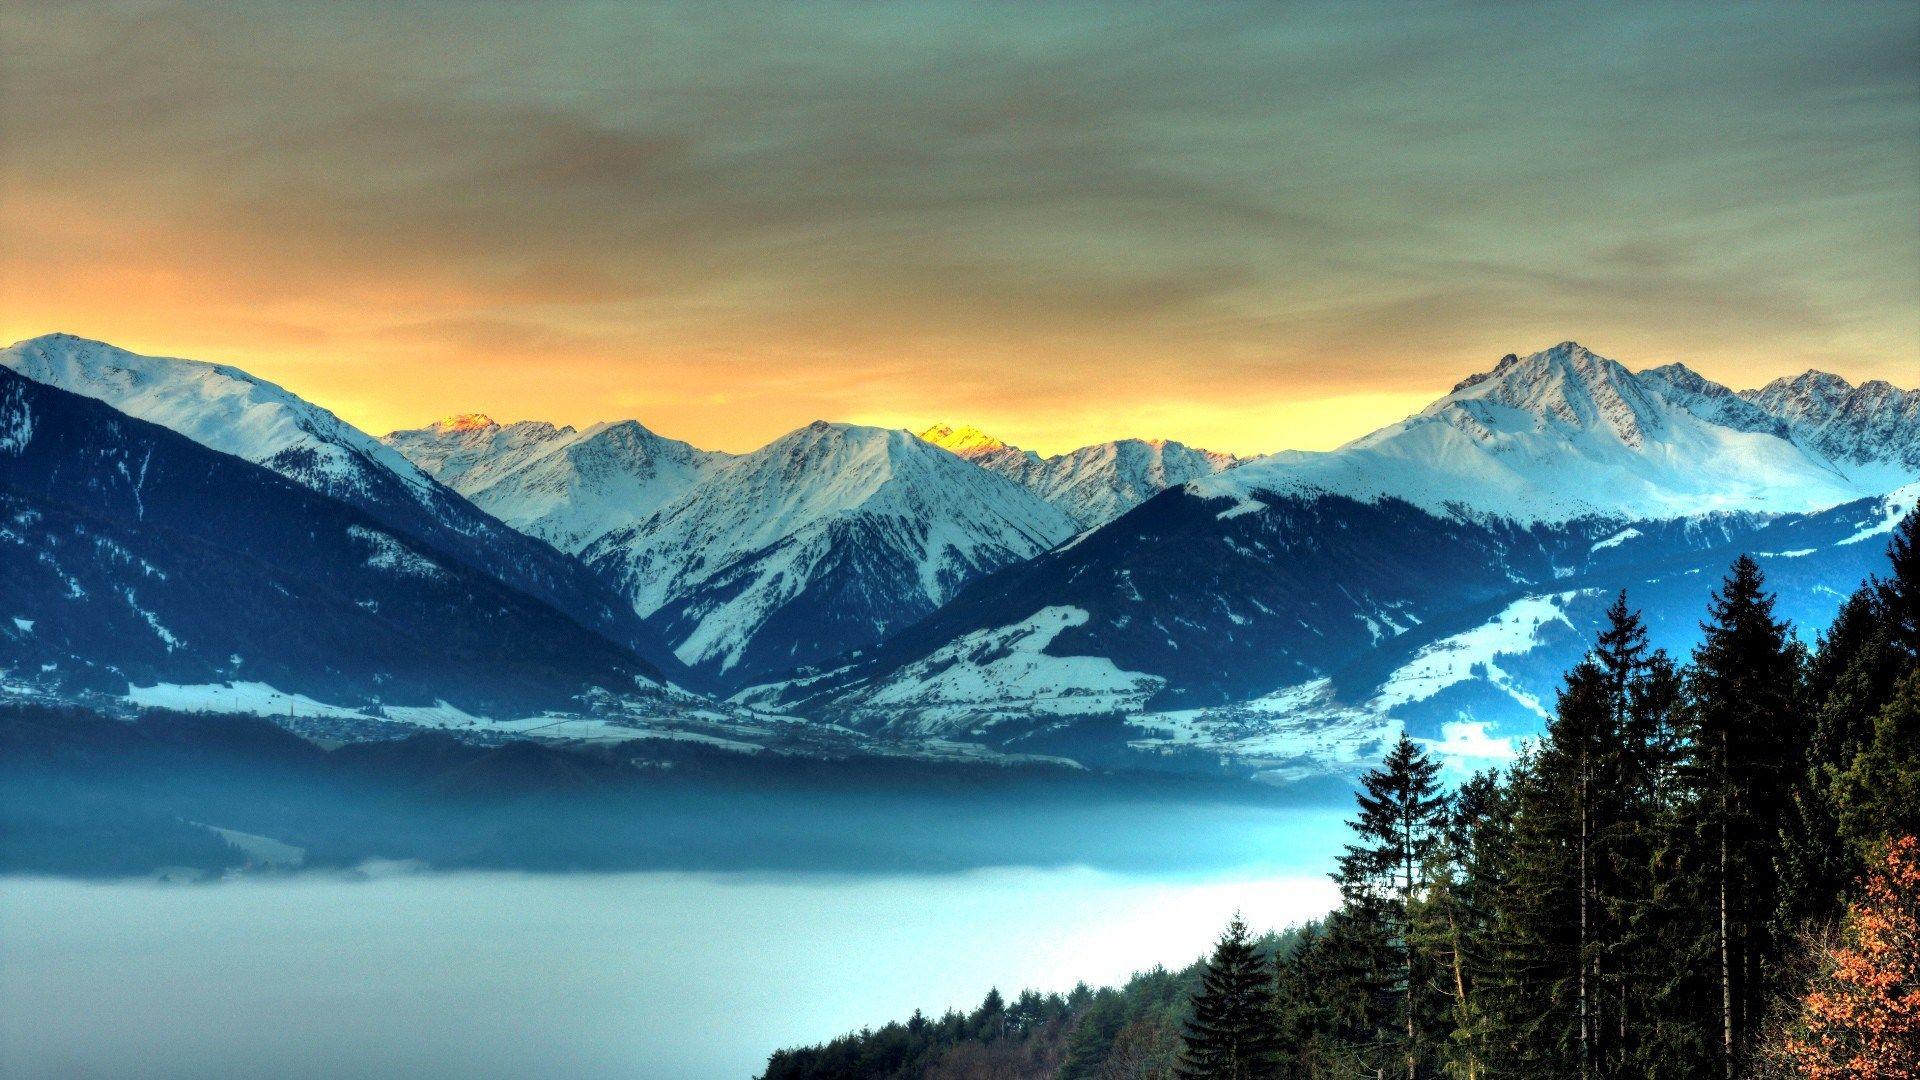 Computer Desktop Snowy Mountain Wallpaper Full Hd Com Imagens